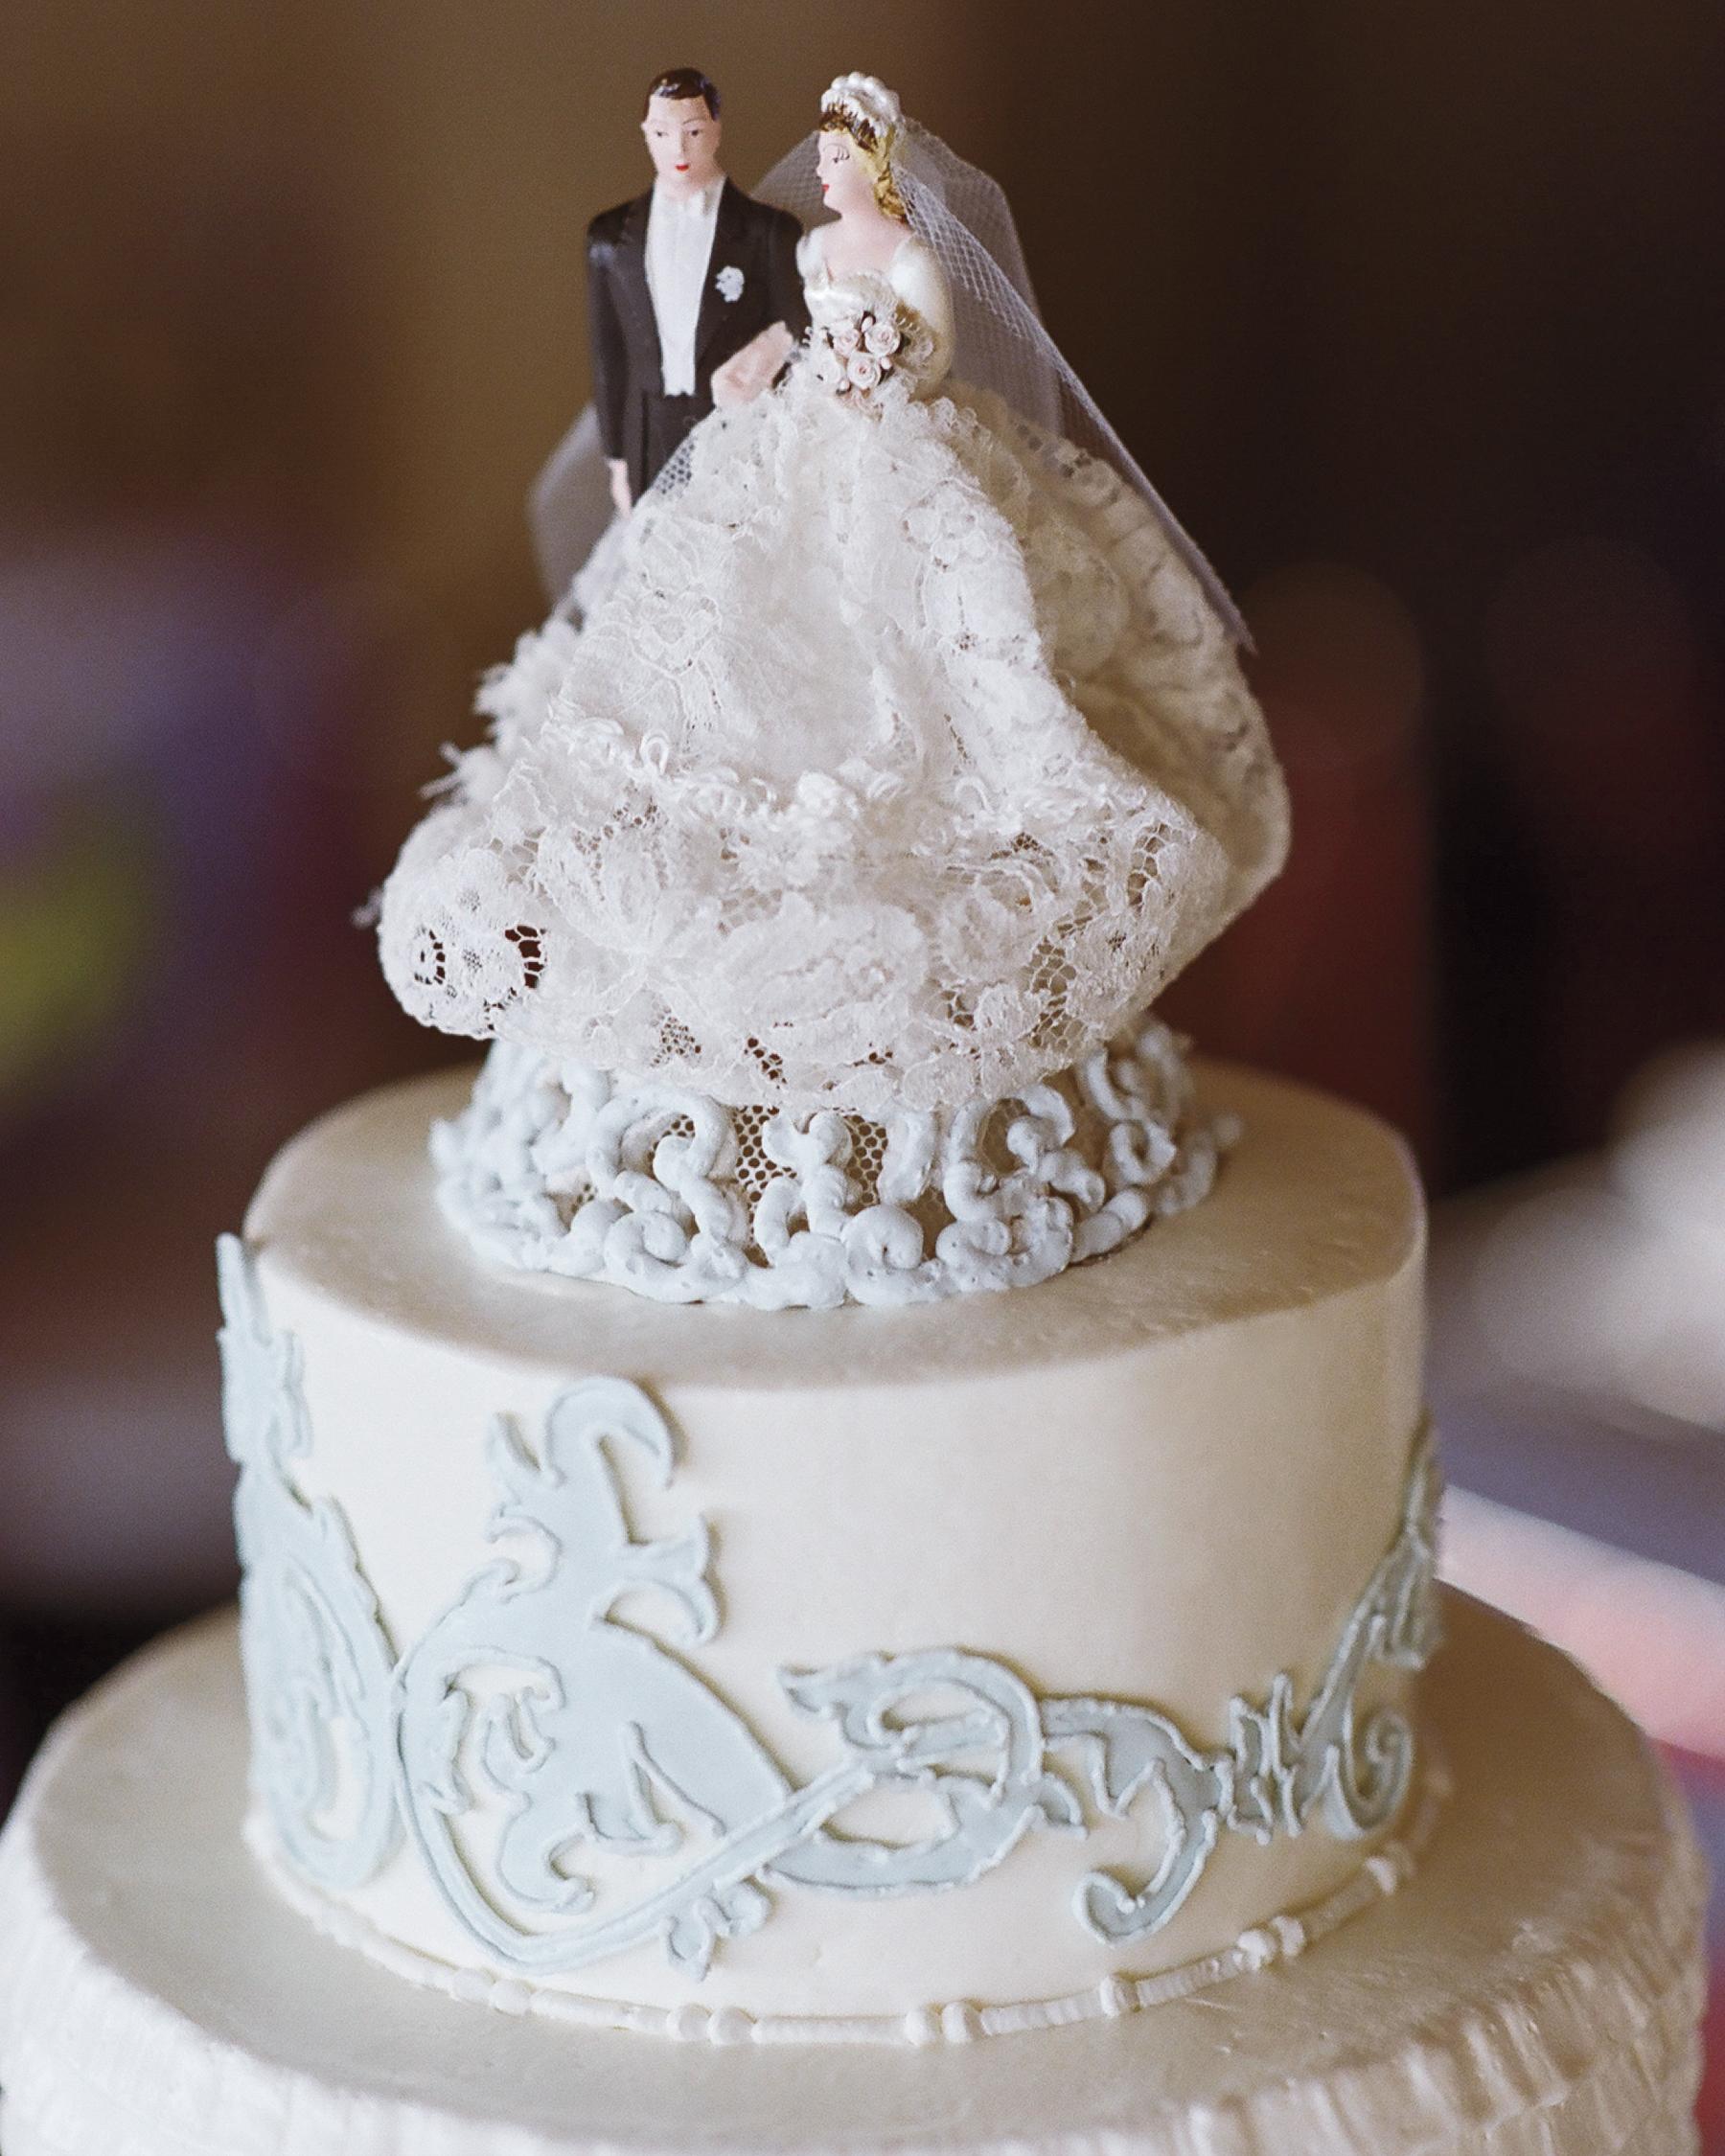 cake-topper-mwds109983.jpg